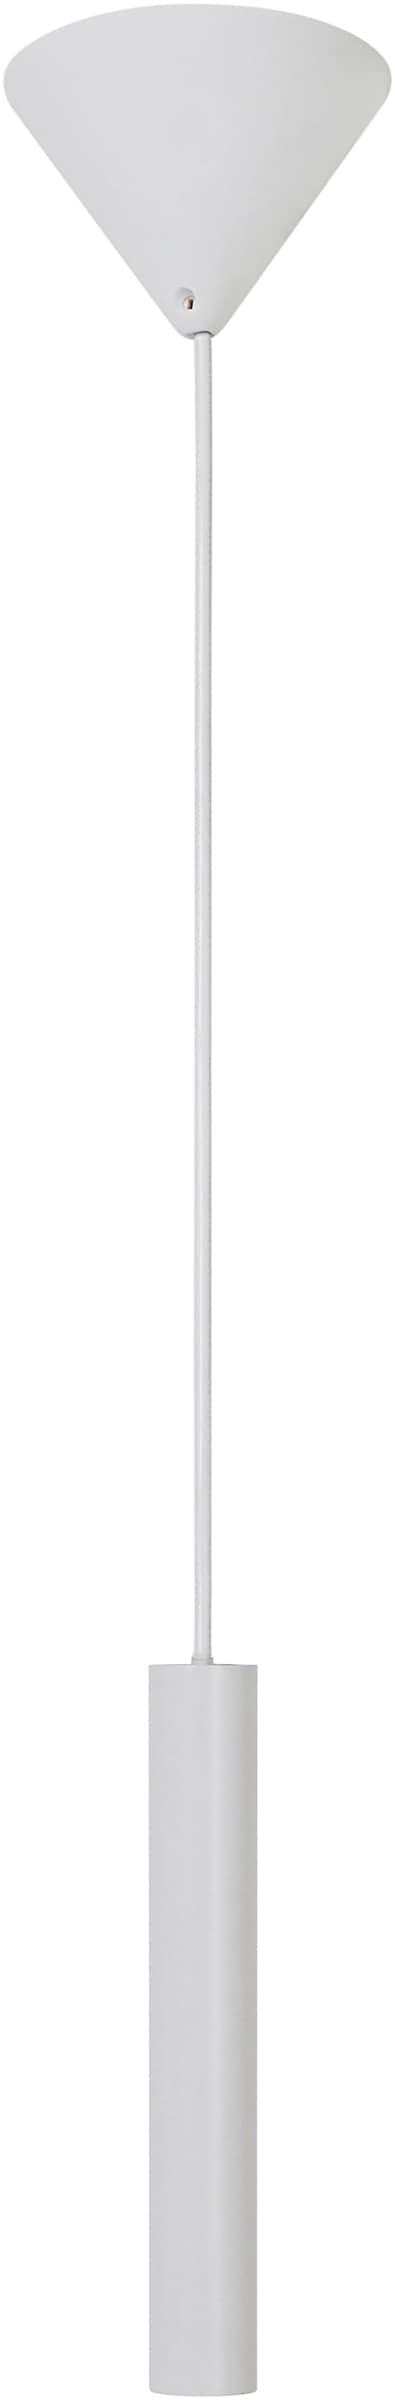 Nordlux LED Pendelleuchte OMARI, LED-Modul, 5 Jahre Garantie auf die LED